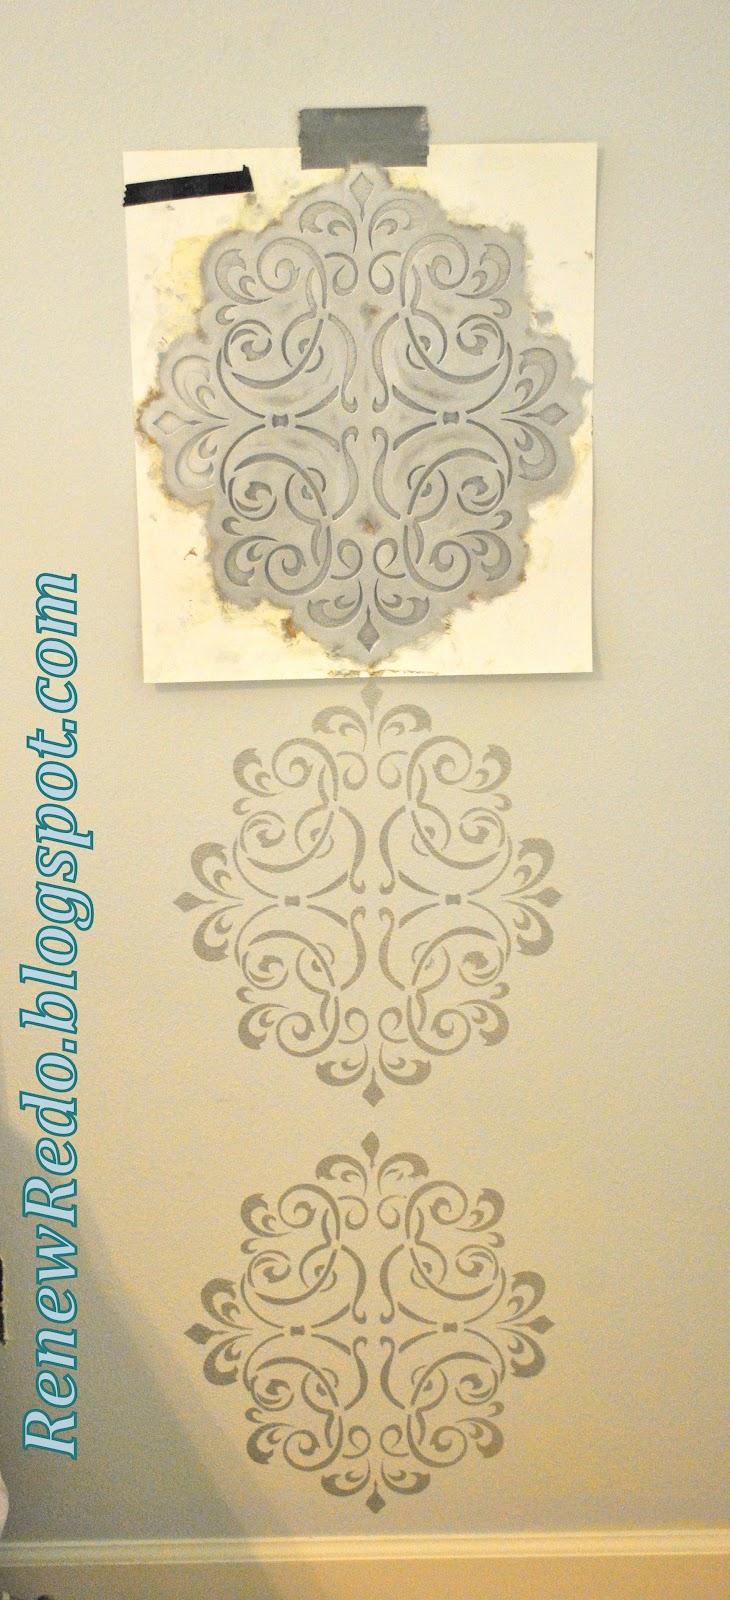 Rub n\' Buff Wall Stencil ~ How To   Home DIY Ideas